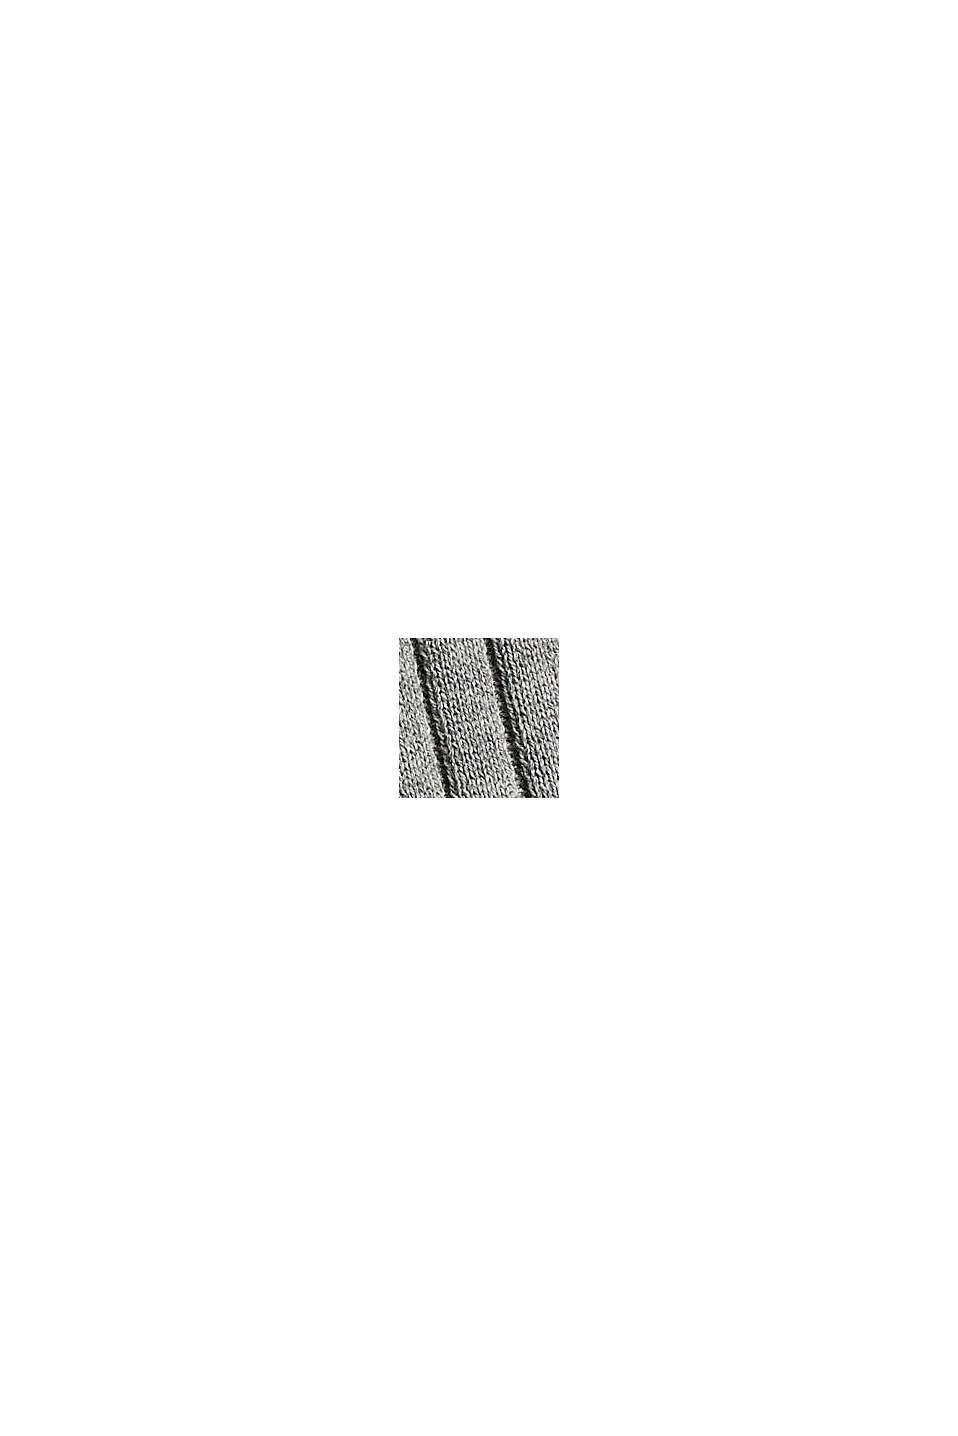 Débardeur côtelé en 100% coton, MEDIUM GREY, swatch